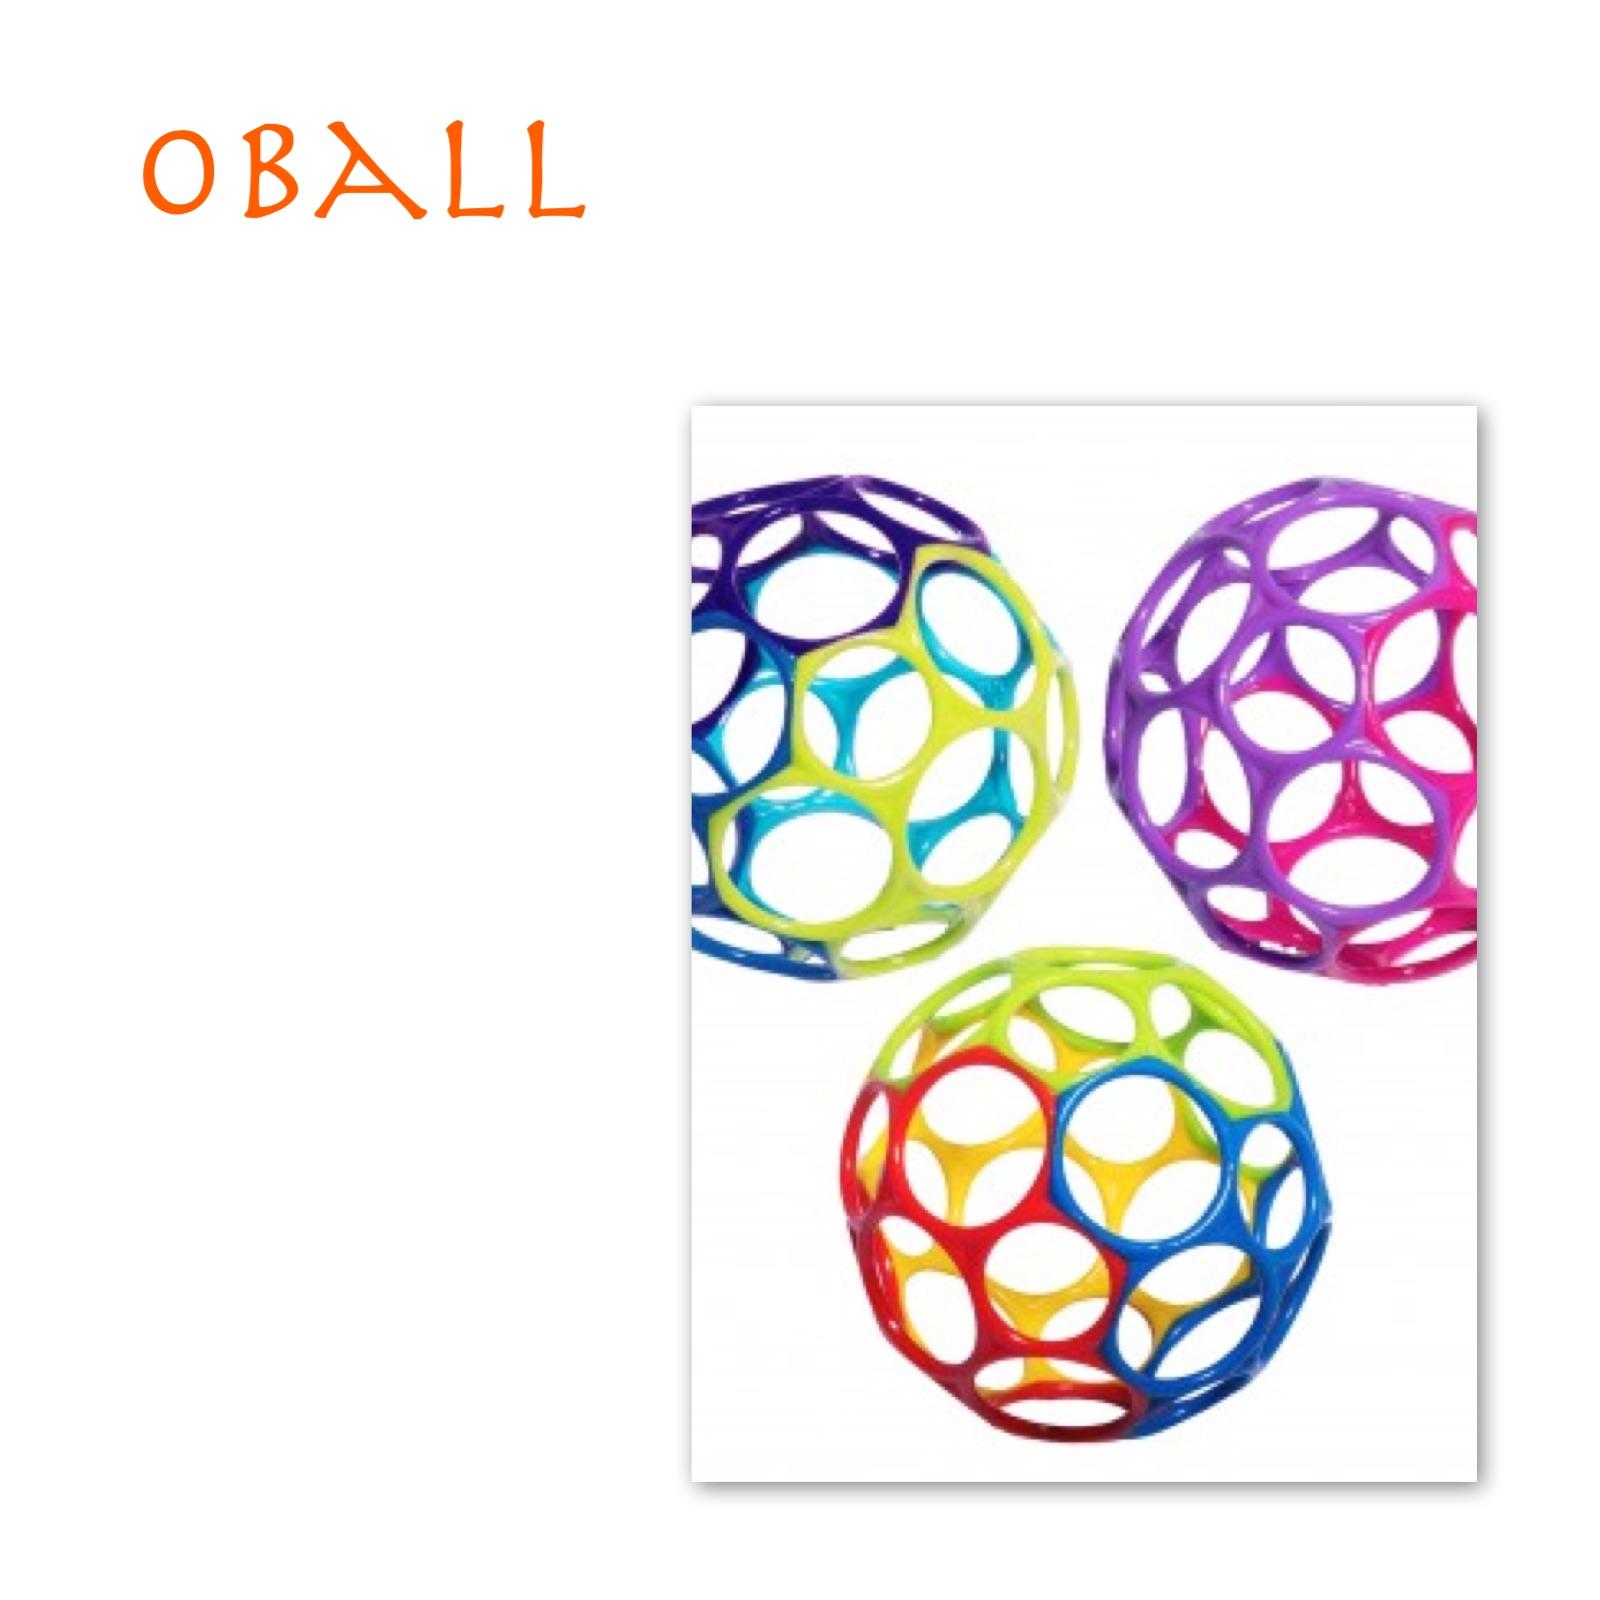 Oball